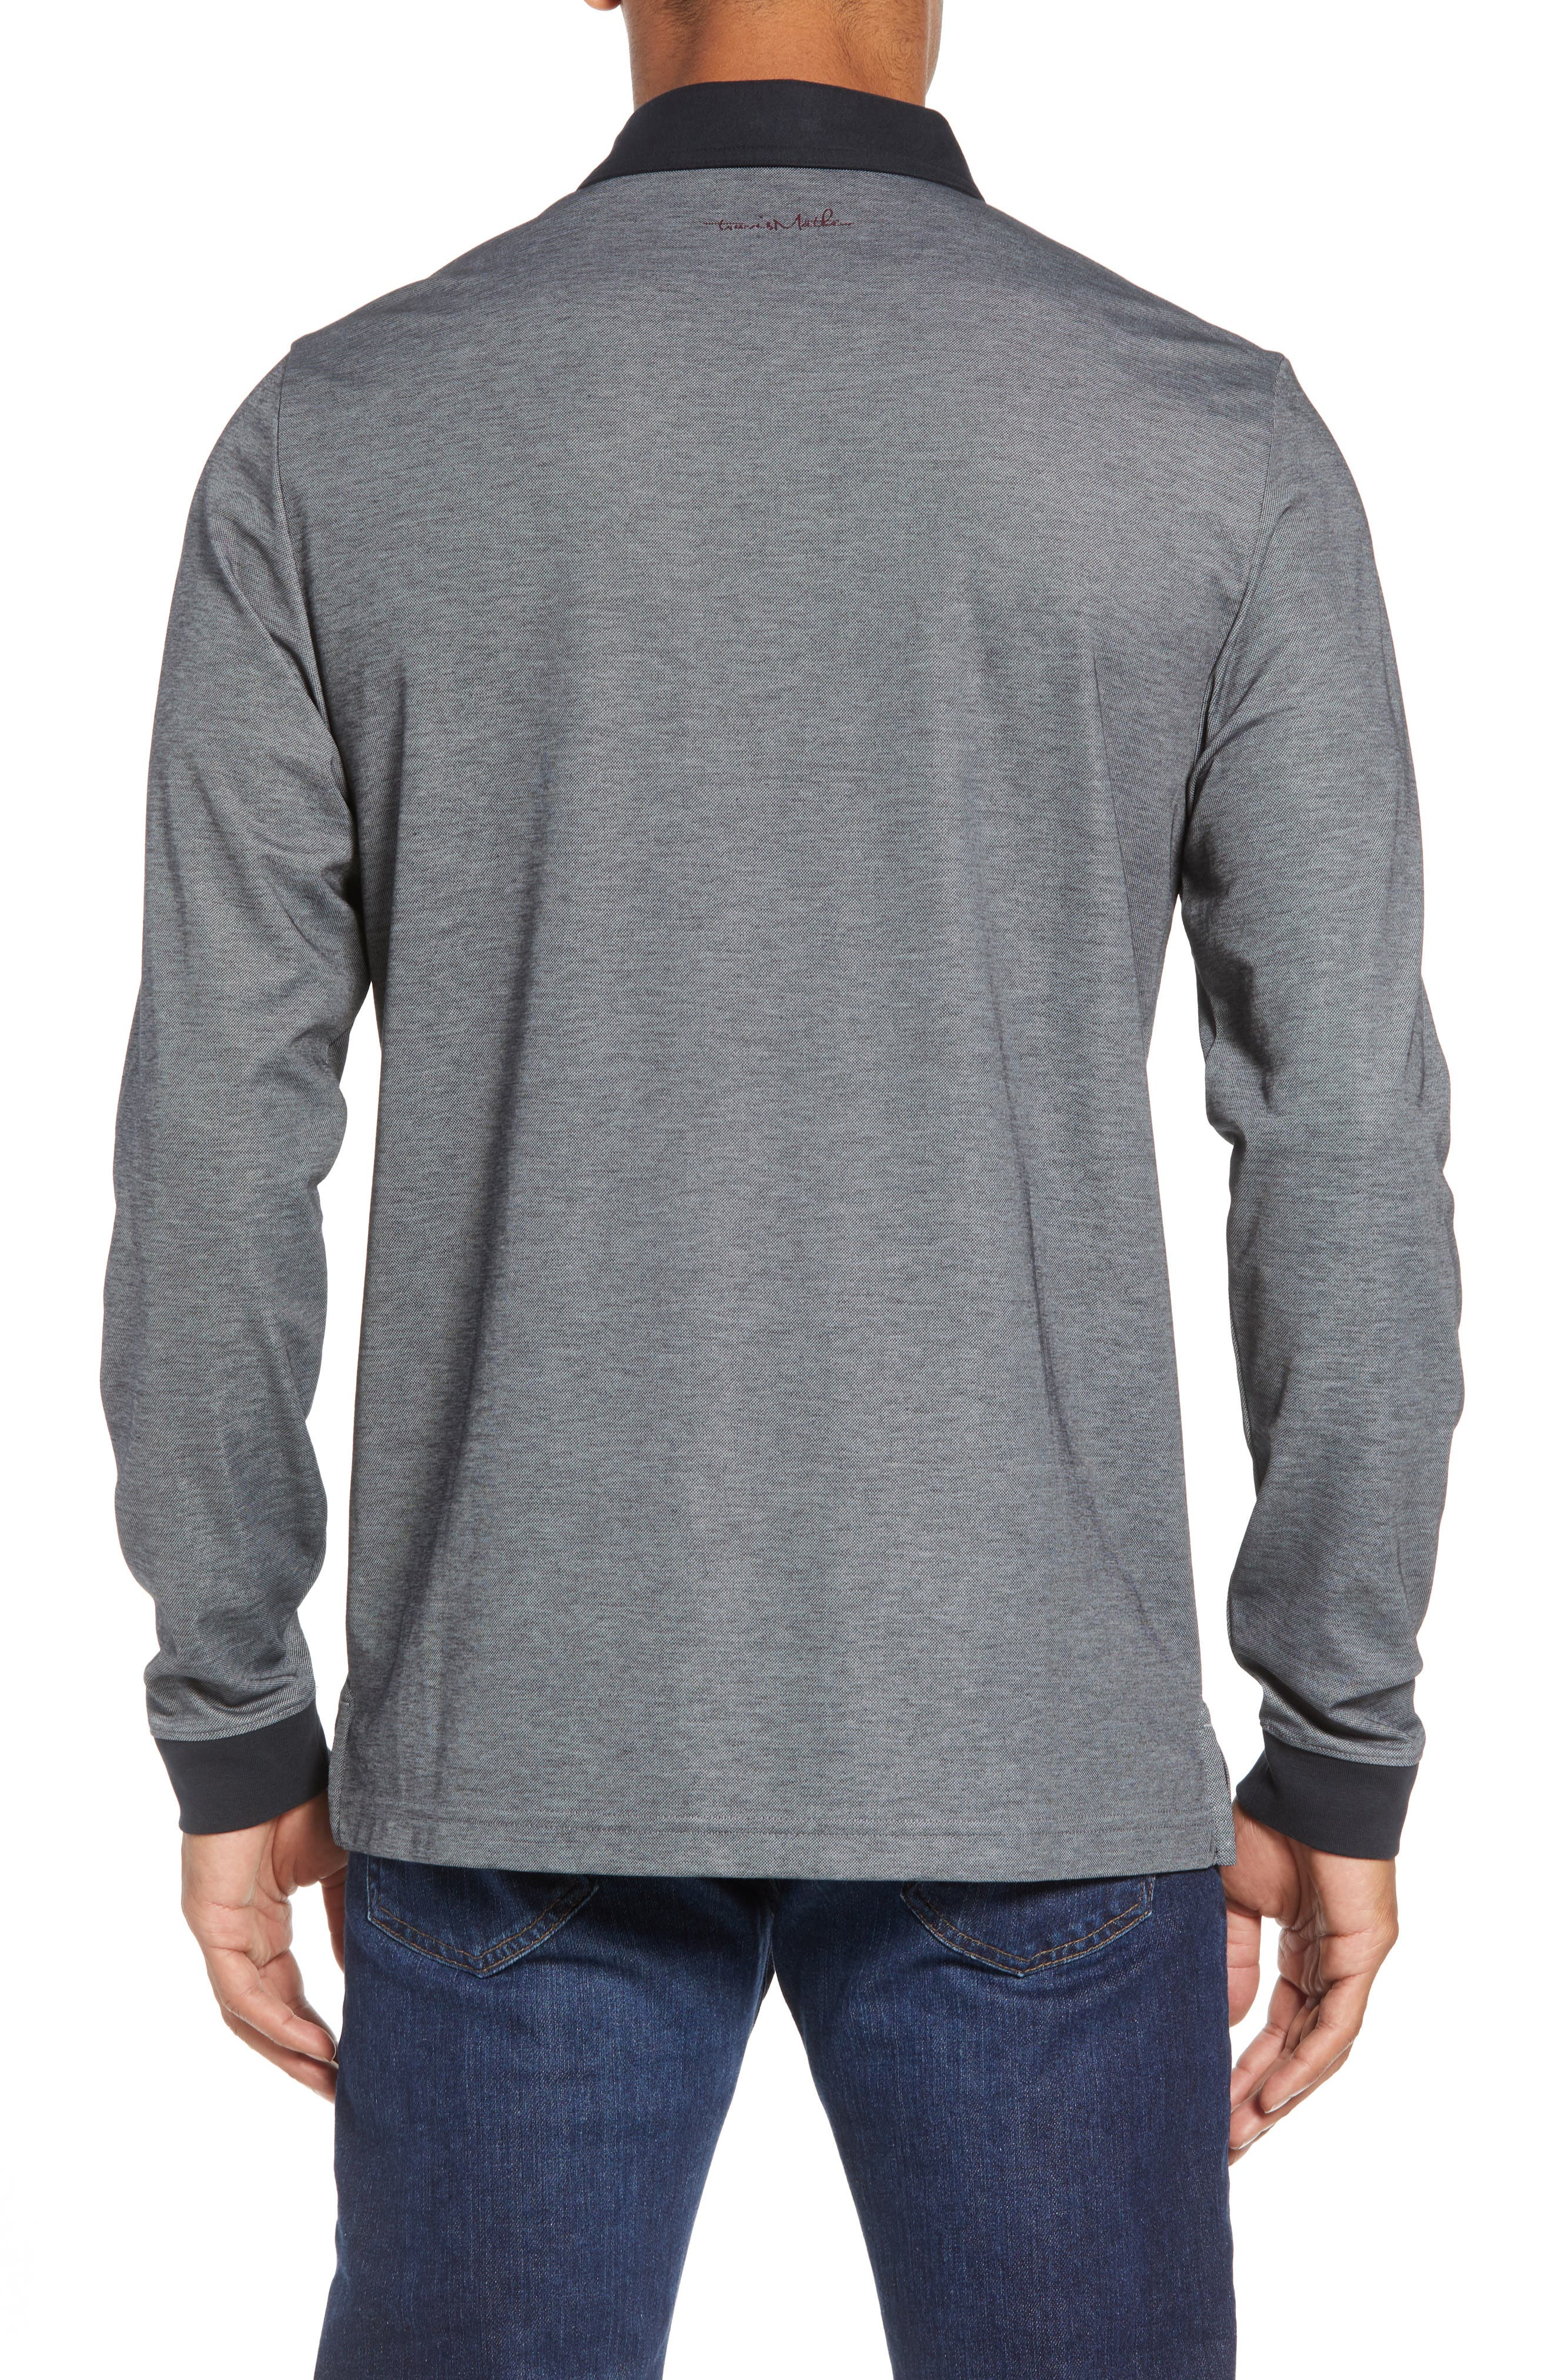 TRAVIS MATHEW,                             Kay Regular Fit Long Sleeve Polo Shirt,                             Alternate thumbnail 2, color,                             020